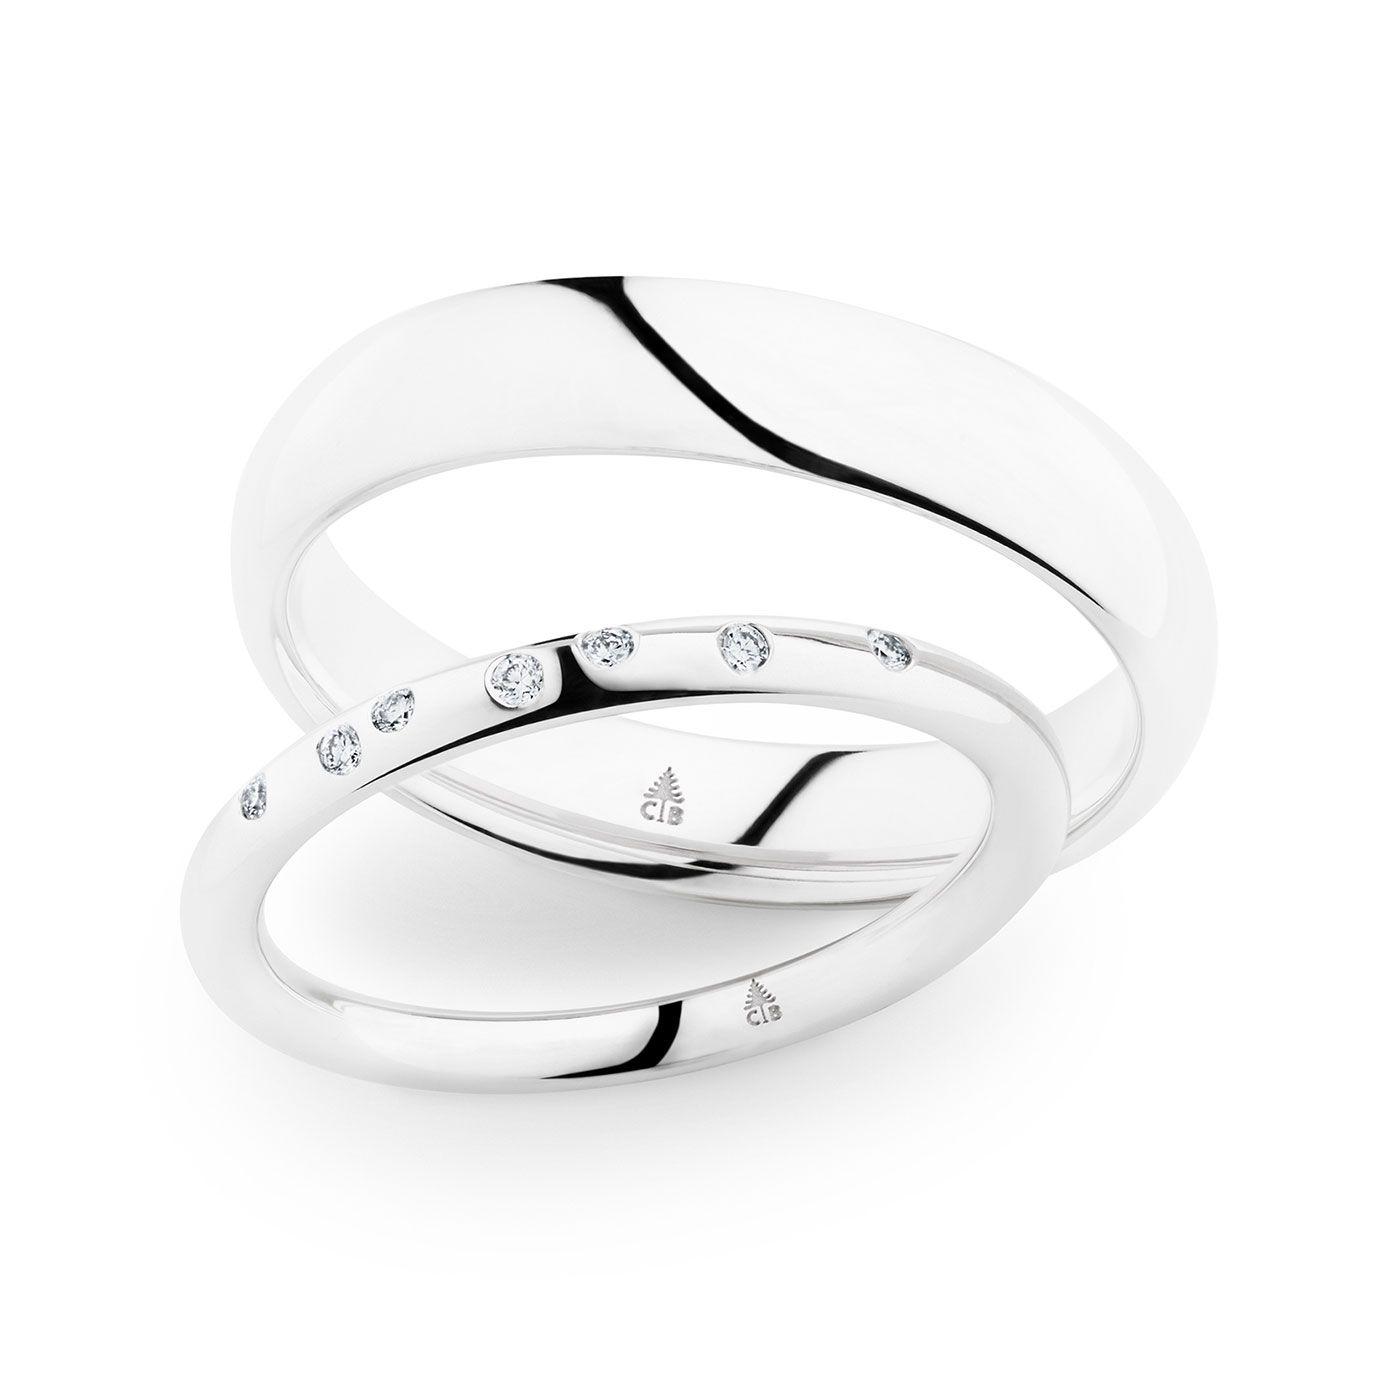 Schmale Ringe mit großer Bedeutung (avec images) | Mariage